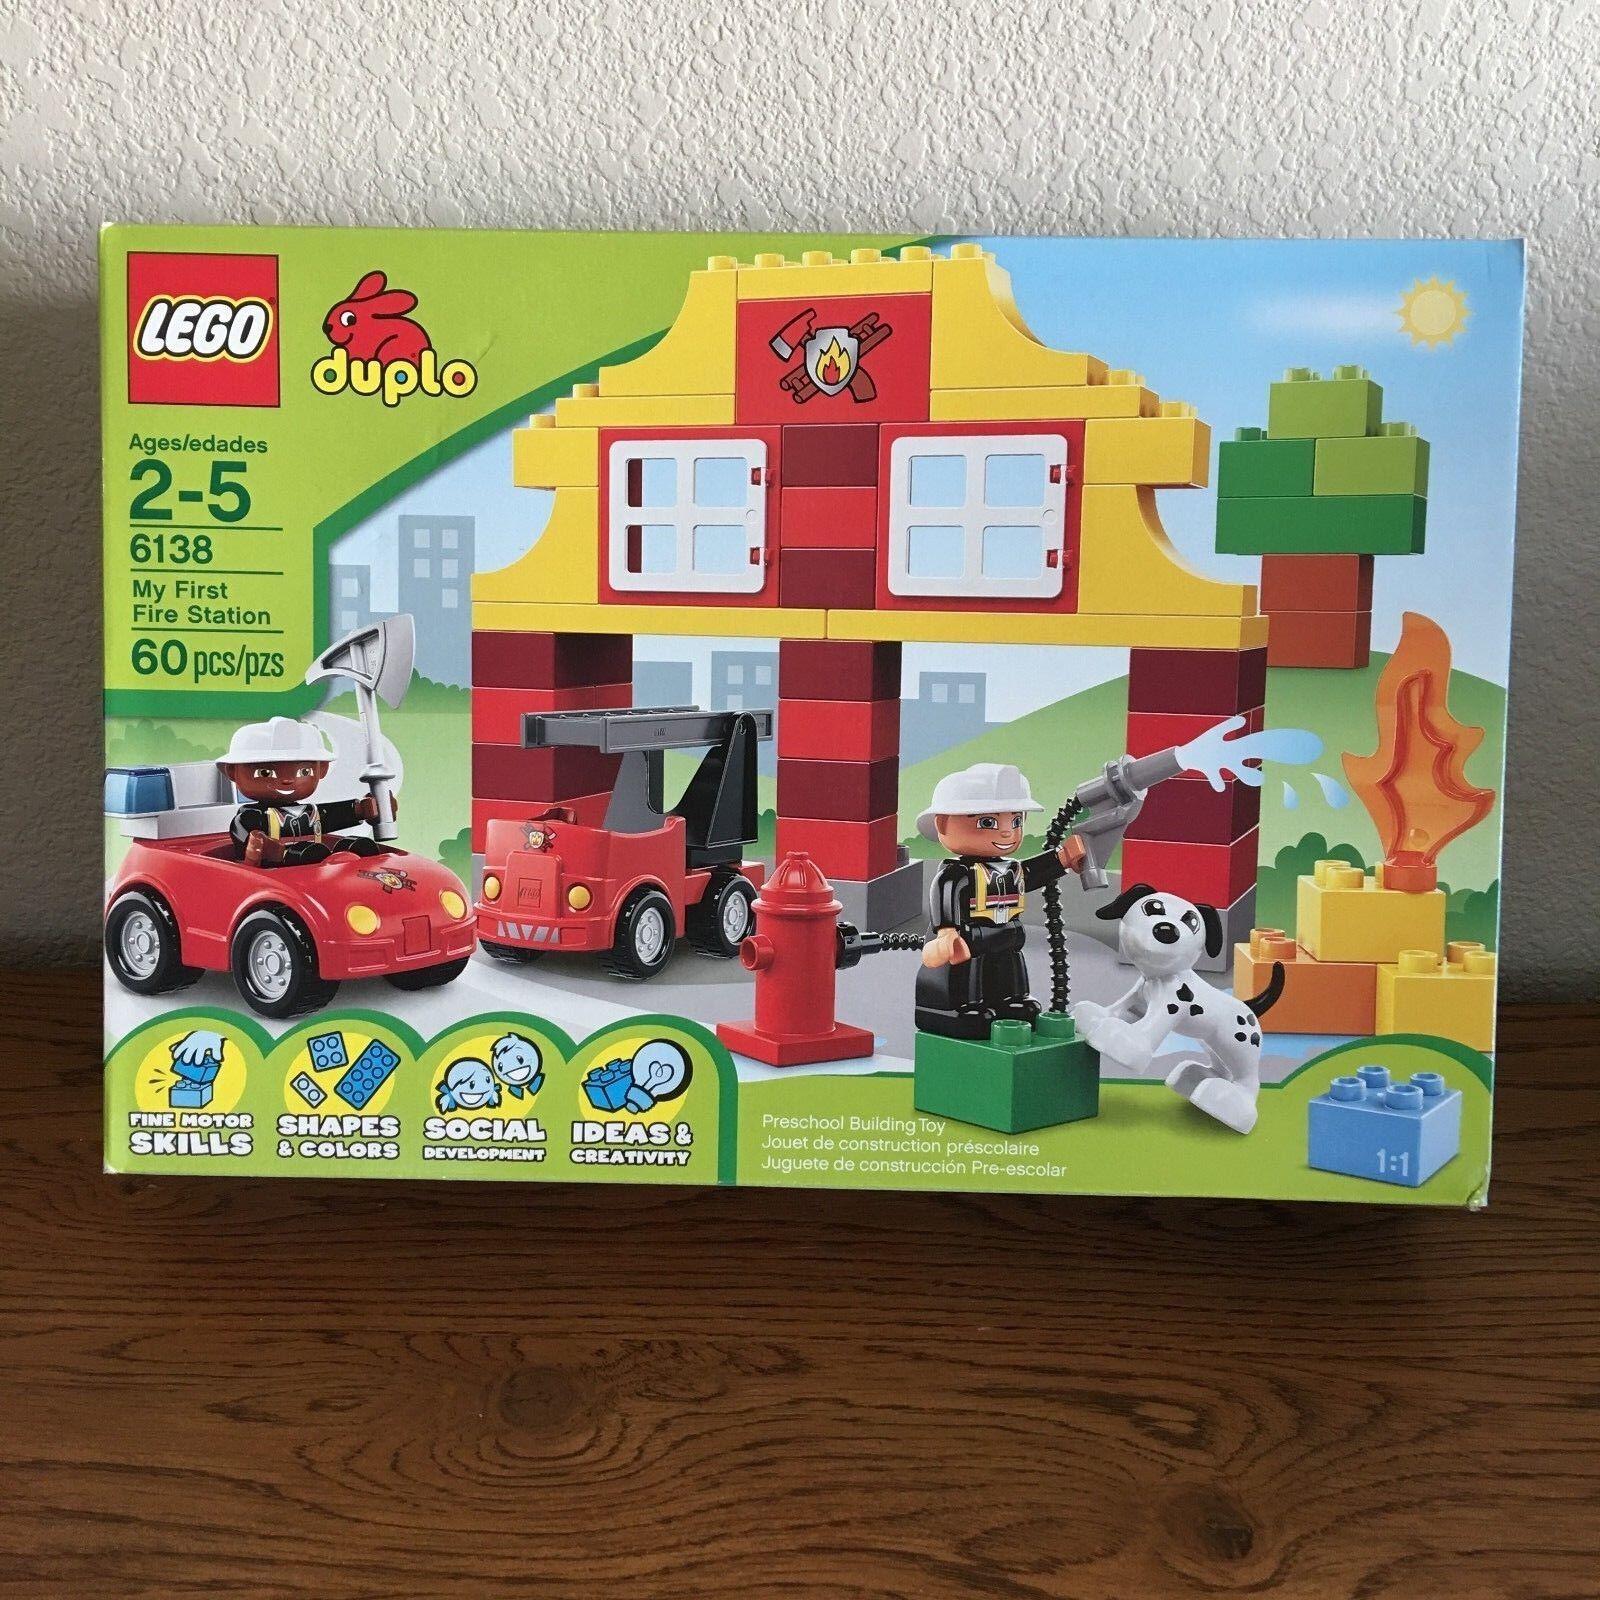 LEGO Duplo Duplo Duplo My First Fire Station (6138) 0f5a9f